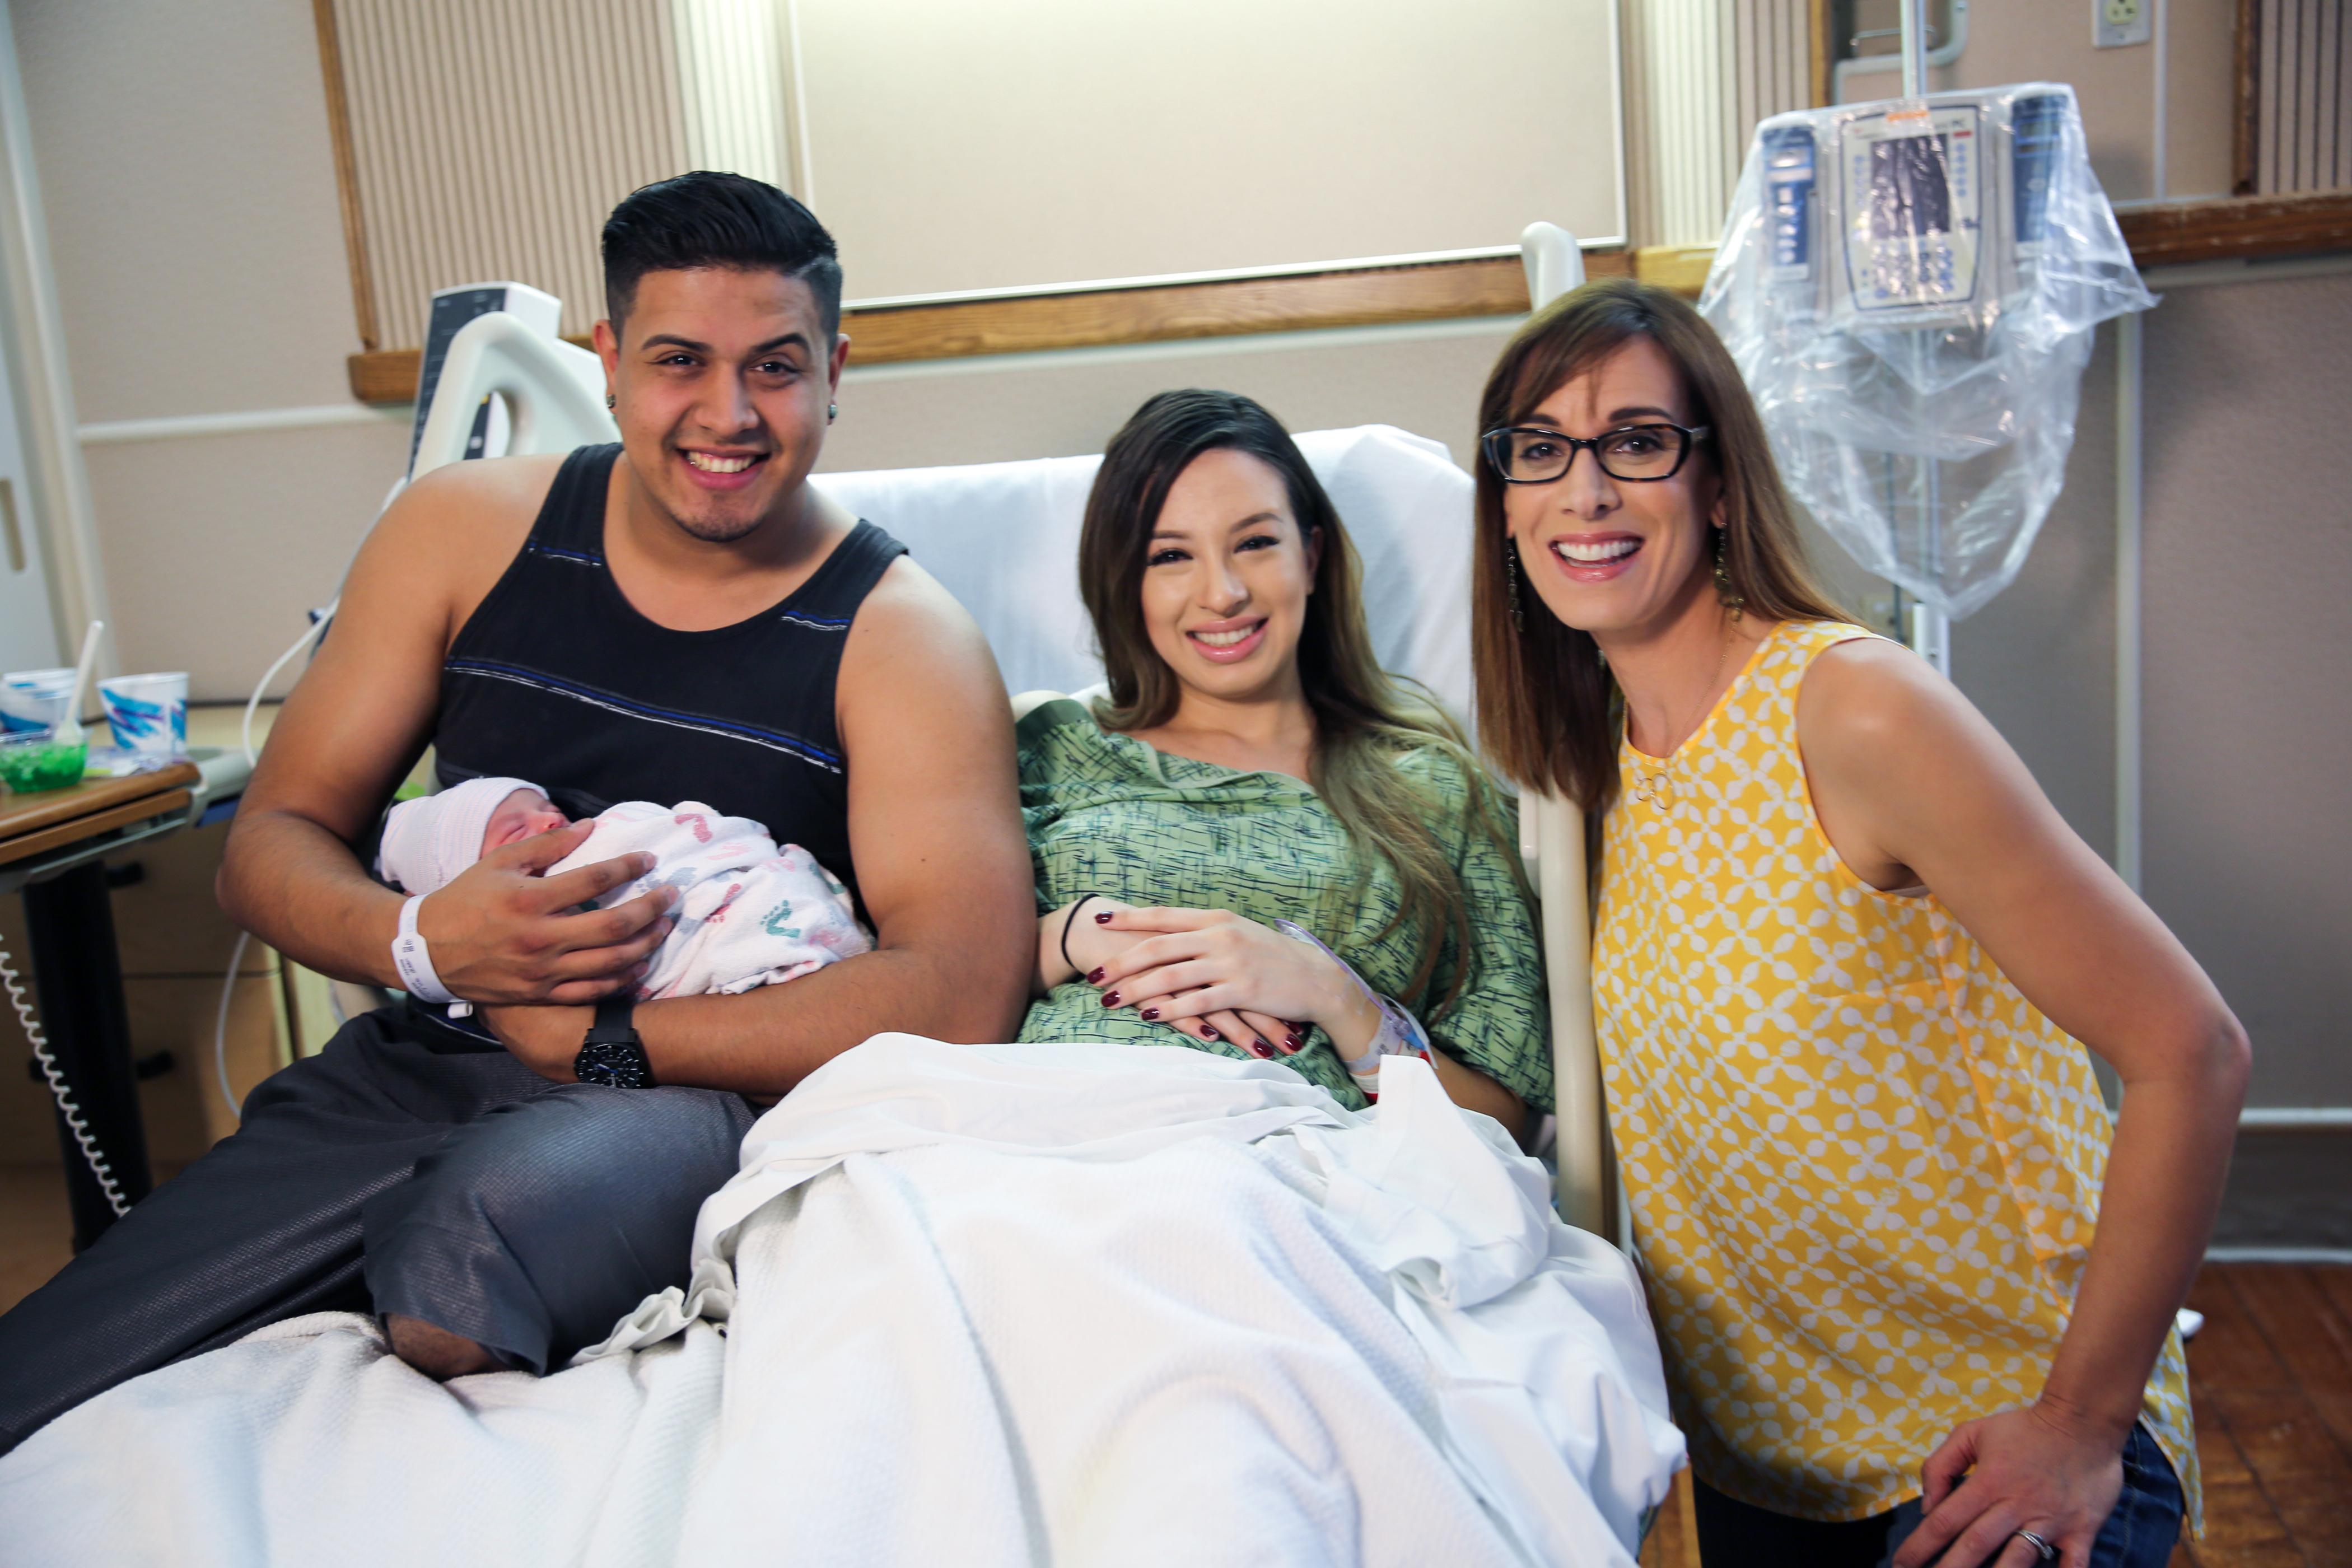 Imagem: TLC Jesse, Jesus Jose Horedia, Betty and Lisa Arch.